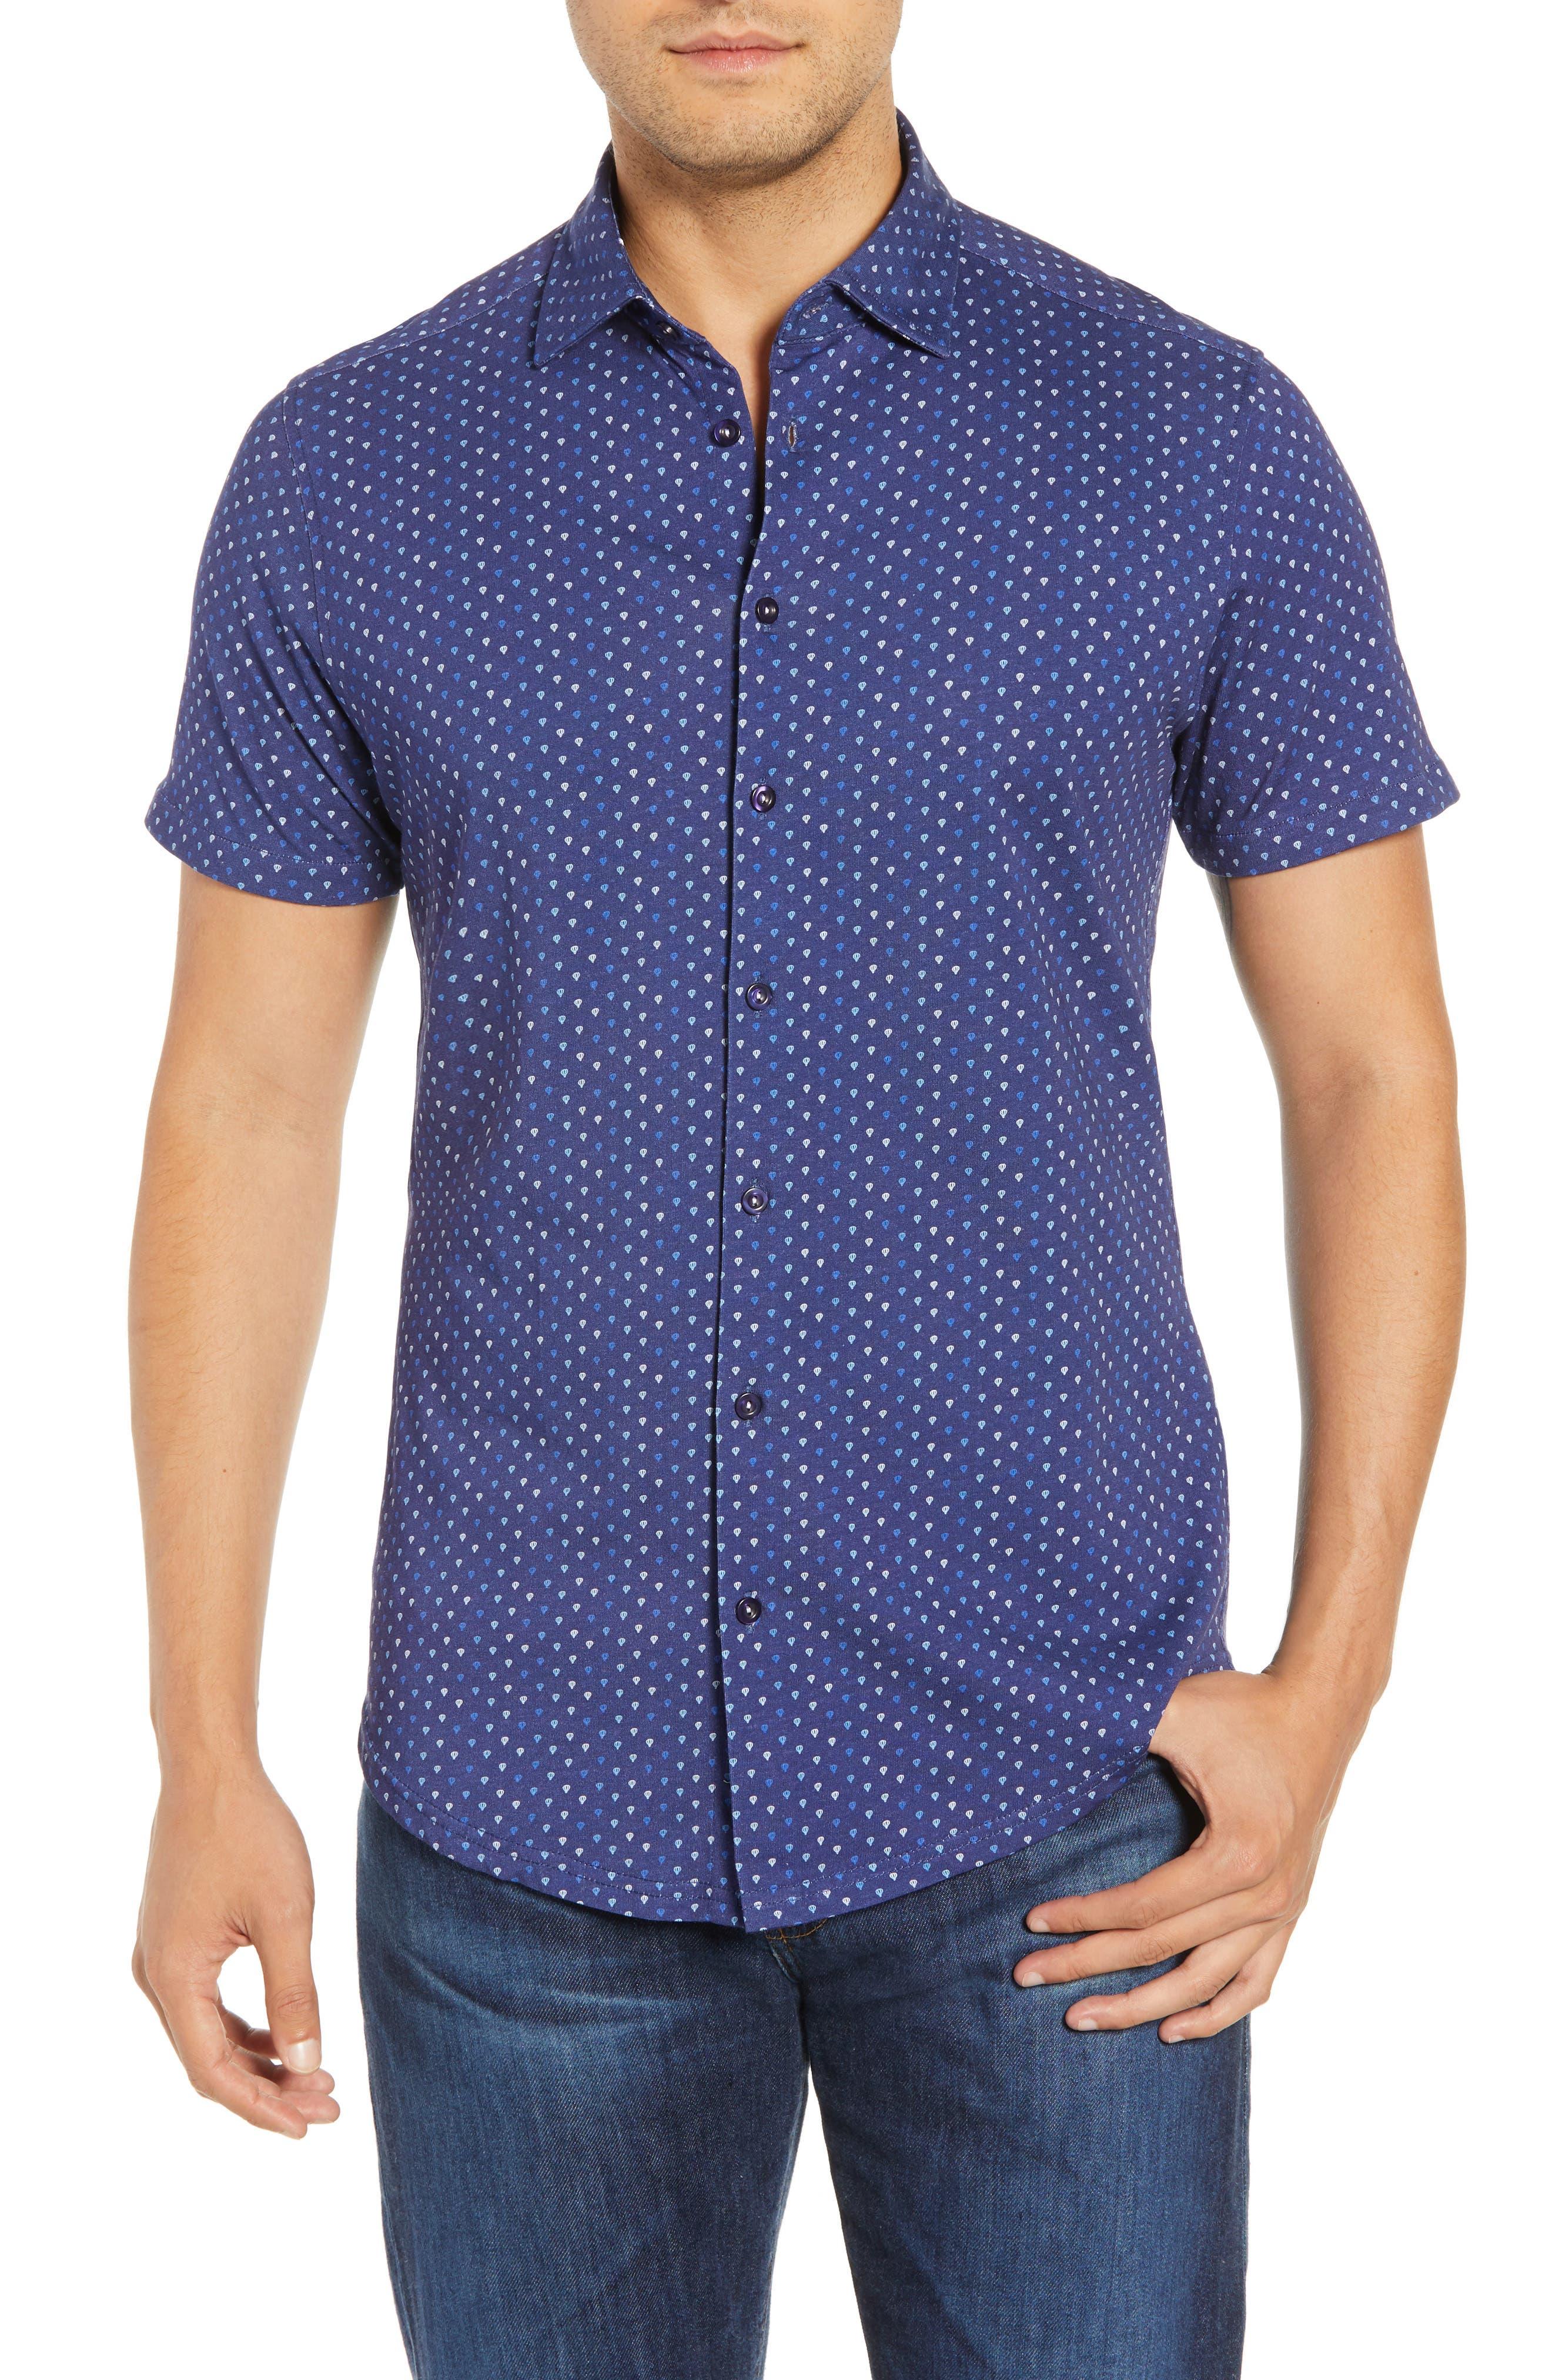 Regular Fit Sport Shirt,                         Main,                         color, NAVY